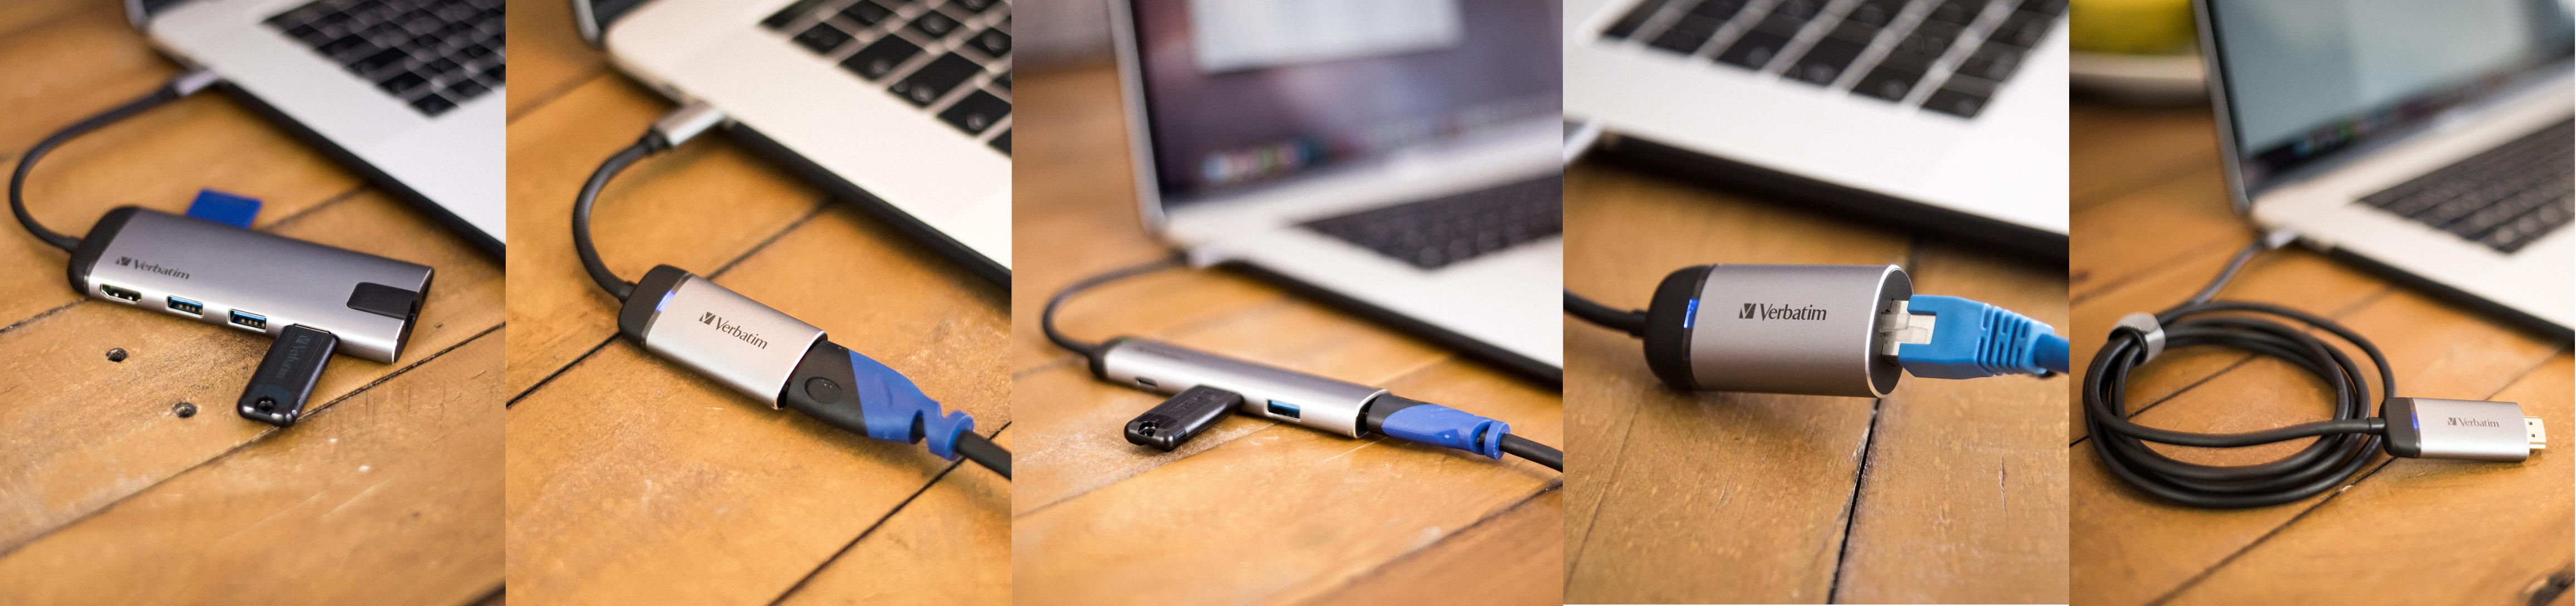 Hub multiport USB-C™ Verbatim - USB 3.0 | HDMI | Gigabit Ethernet | SD/microSD